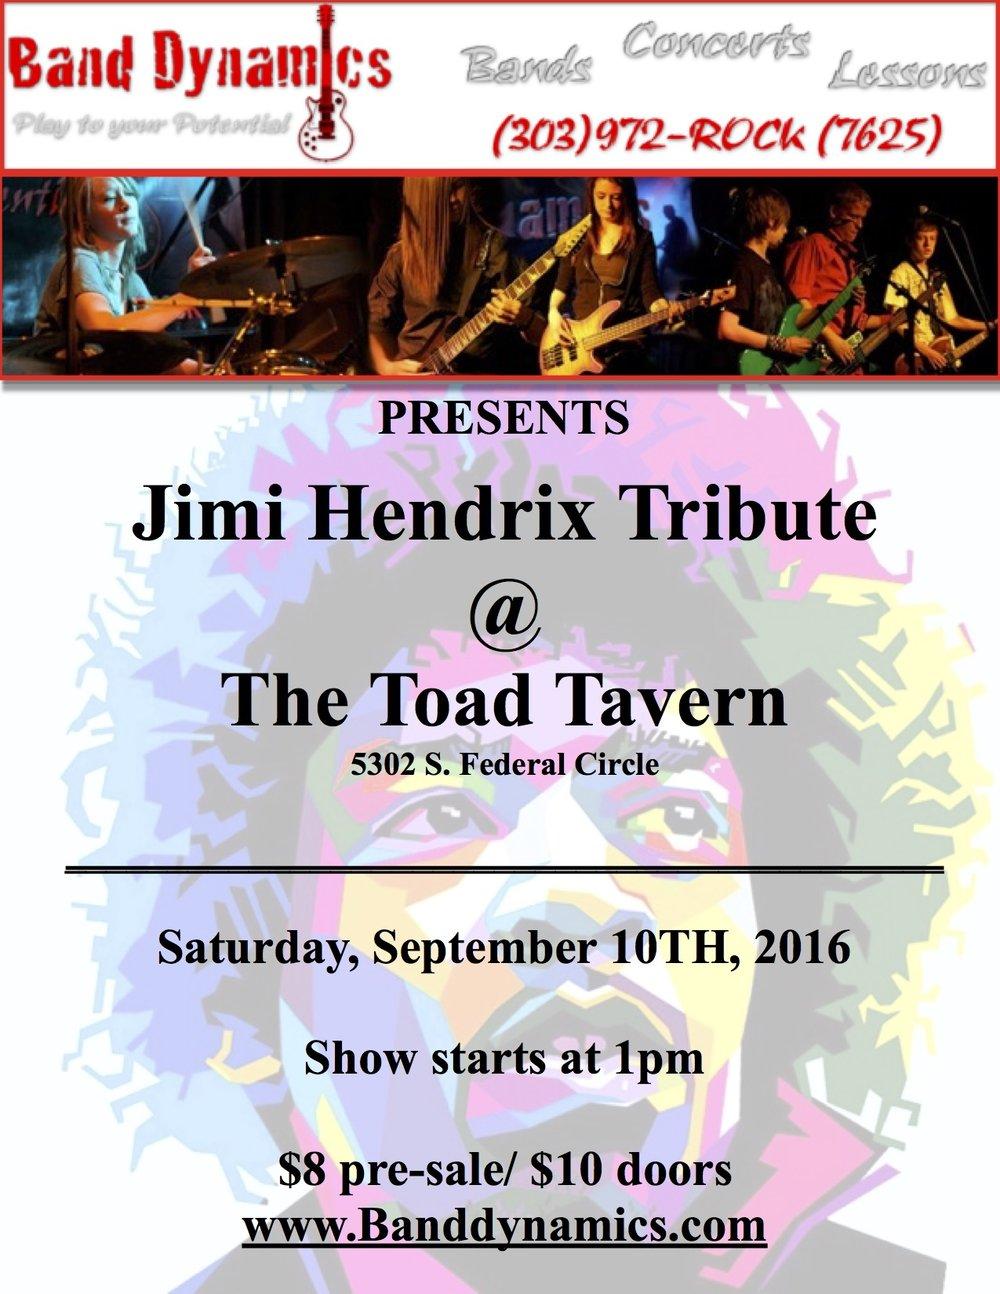 Jimi Hendrix concert poster